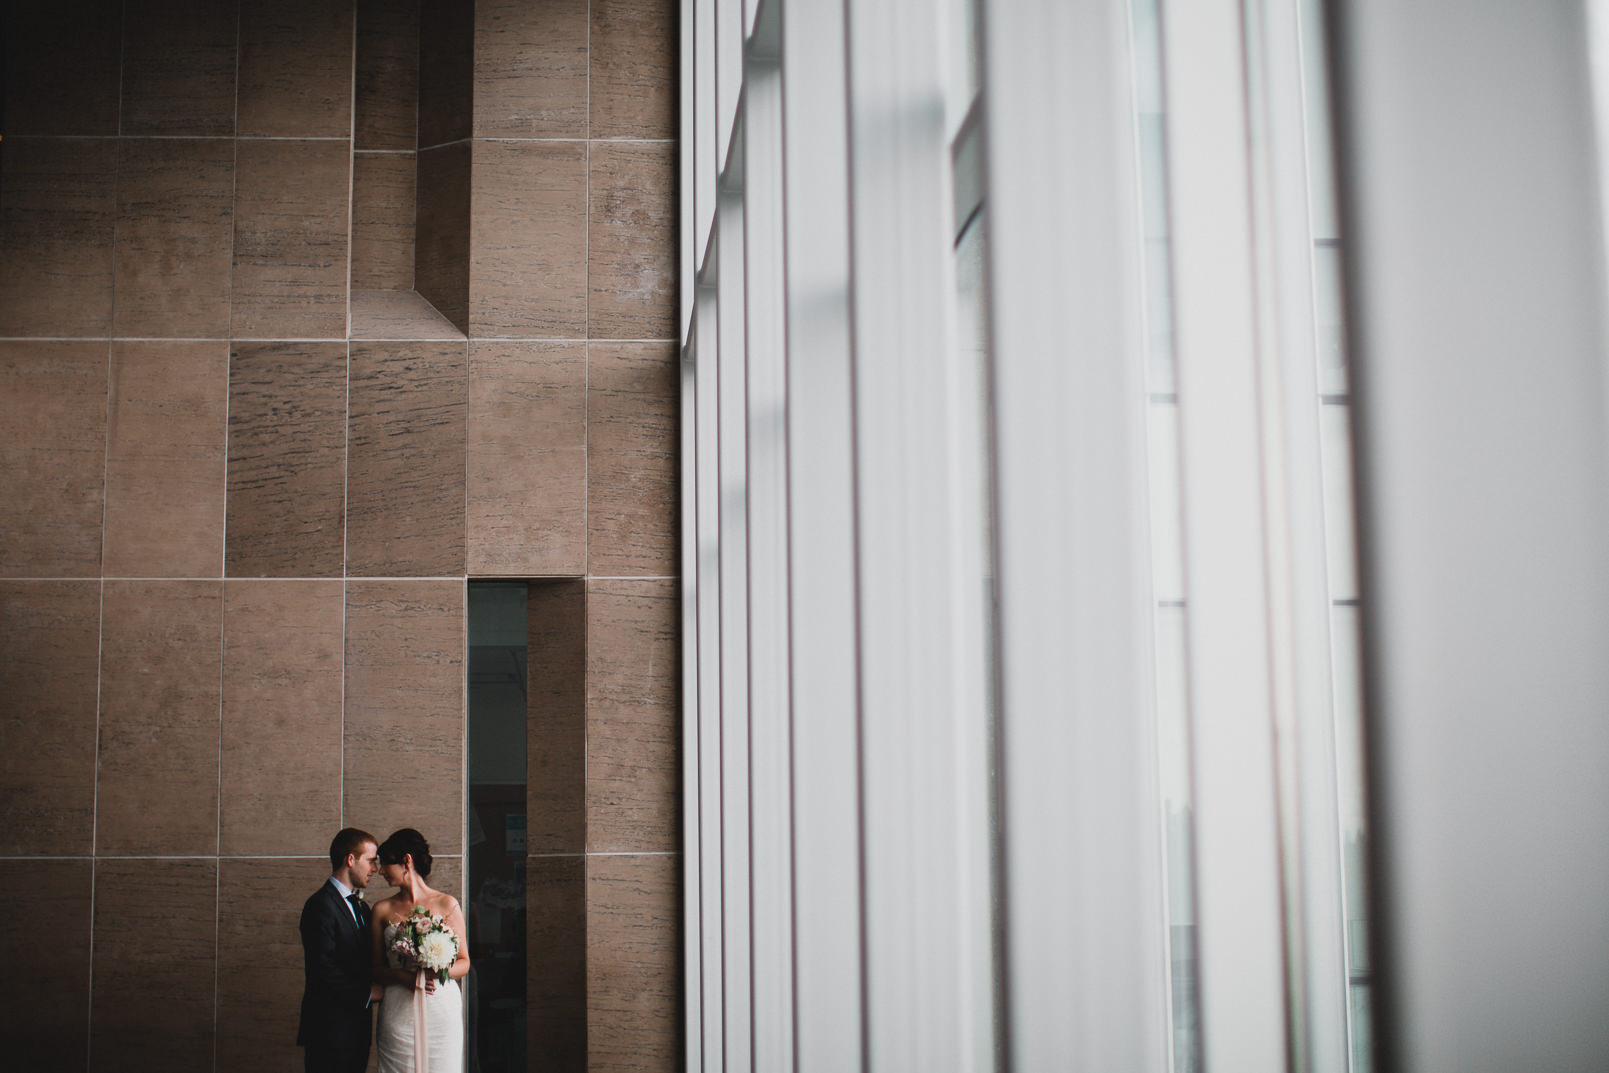 031-Jonathan-Kuhn-Photography-Wedding-_mini.jpg